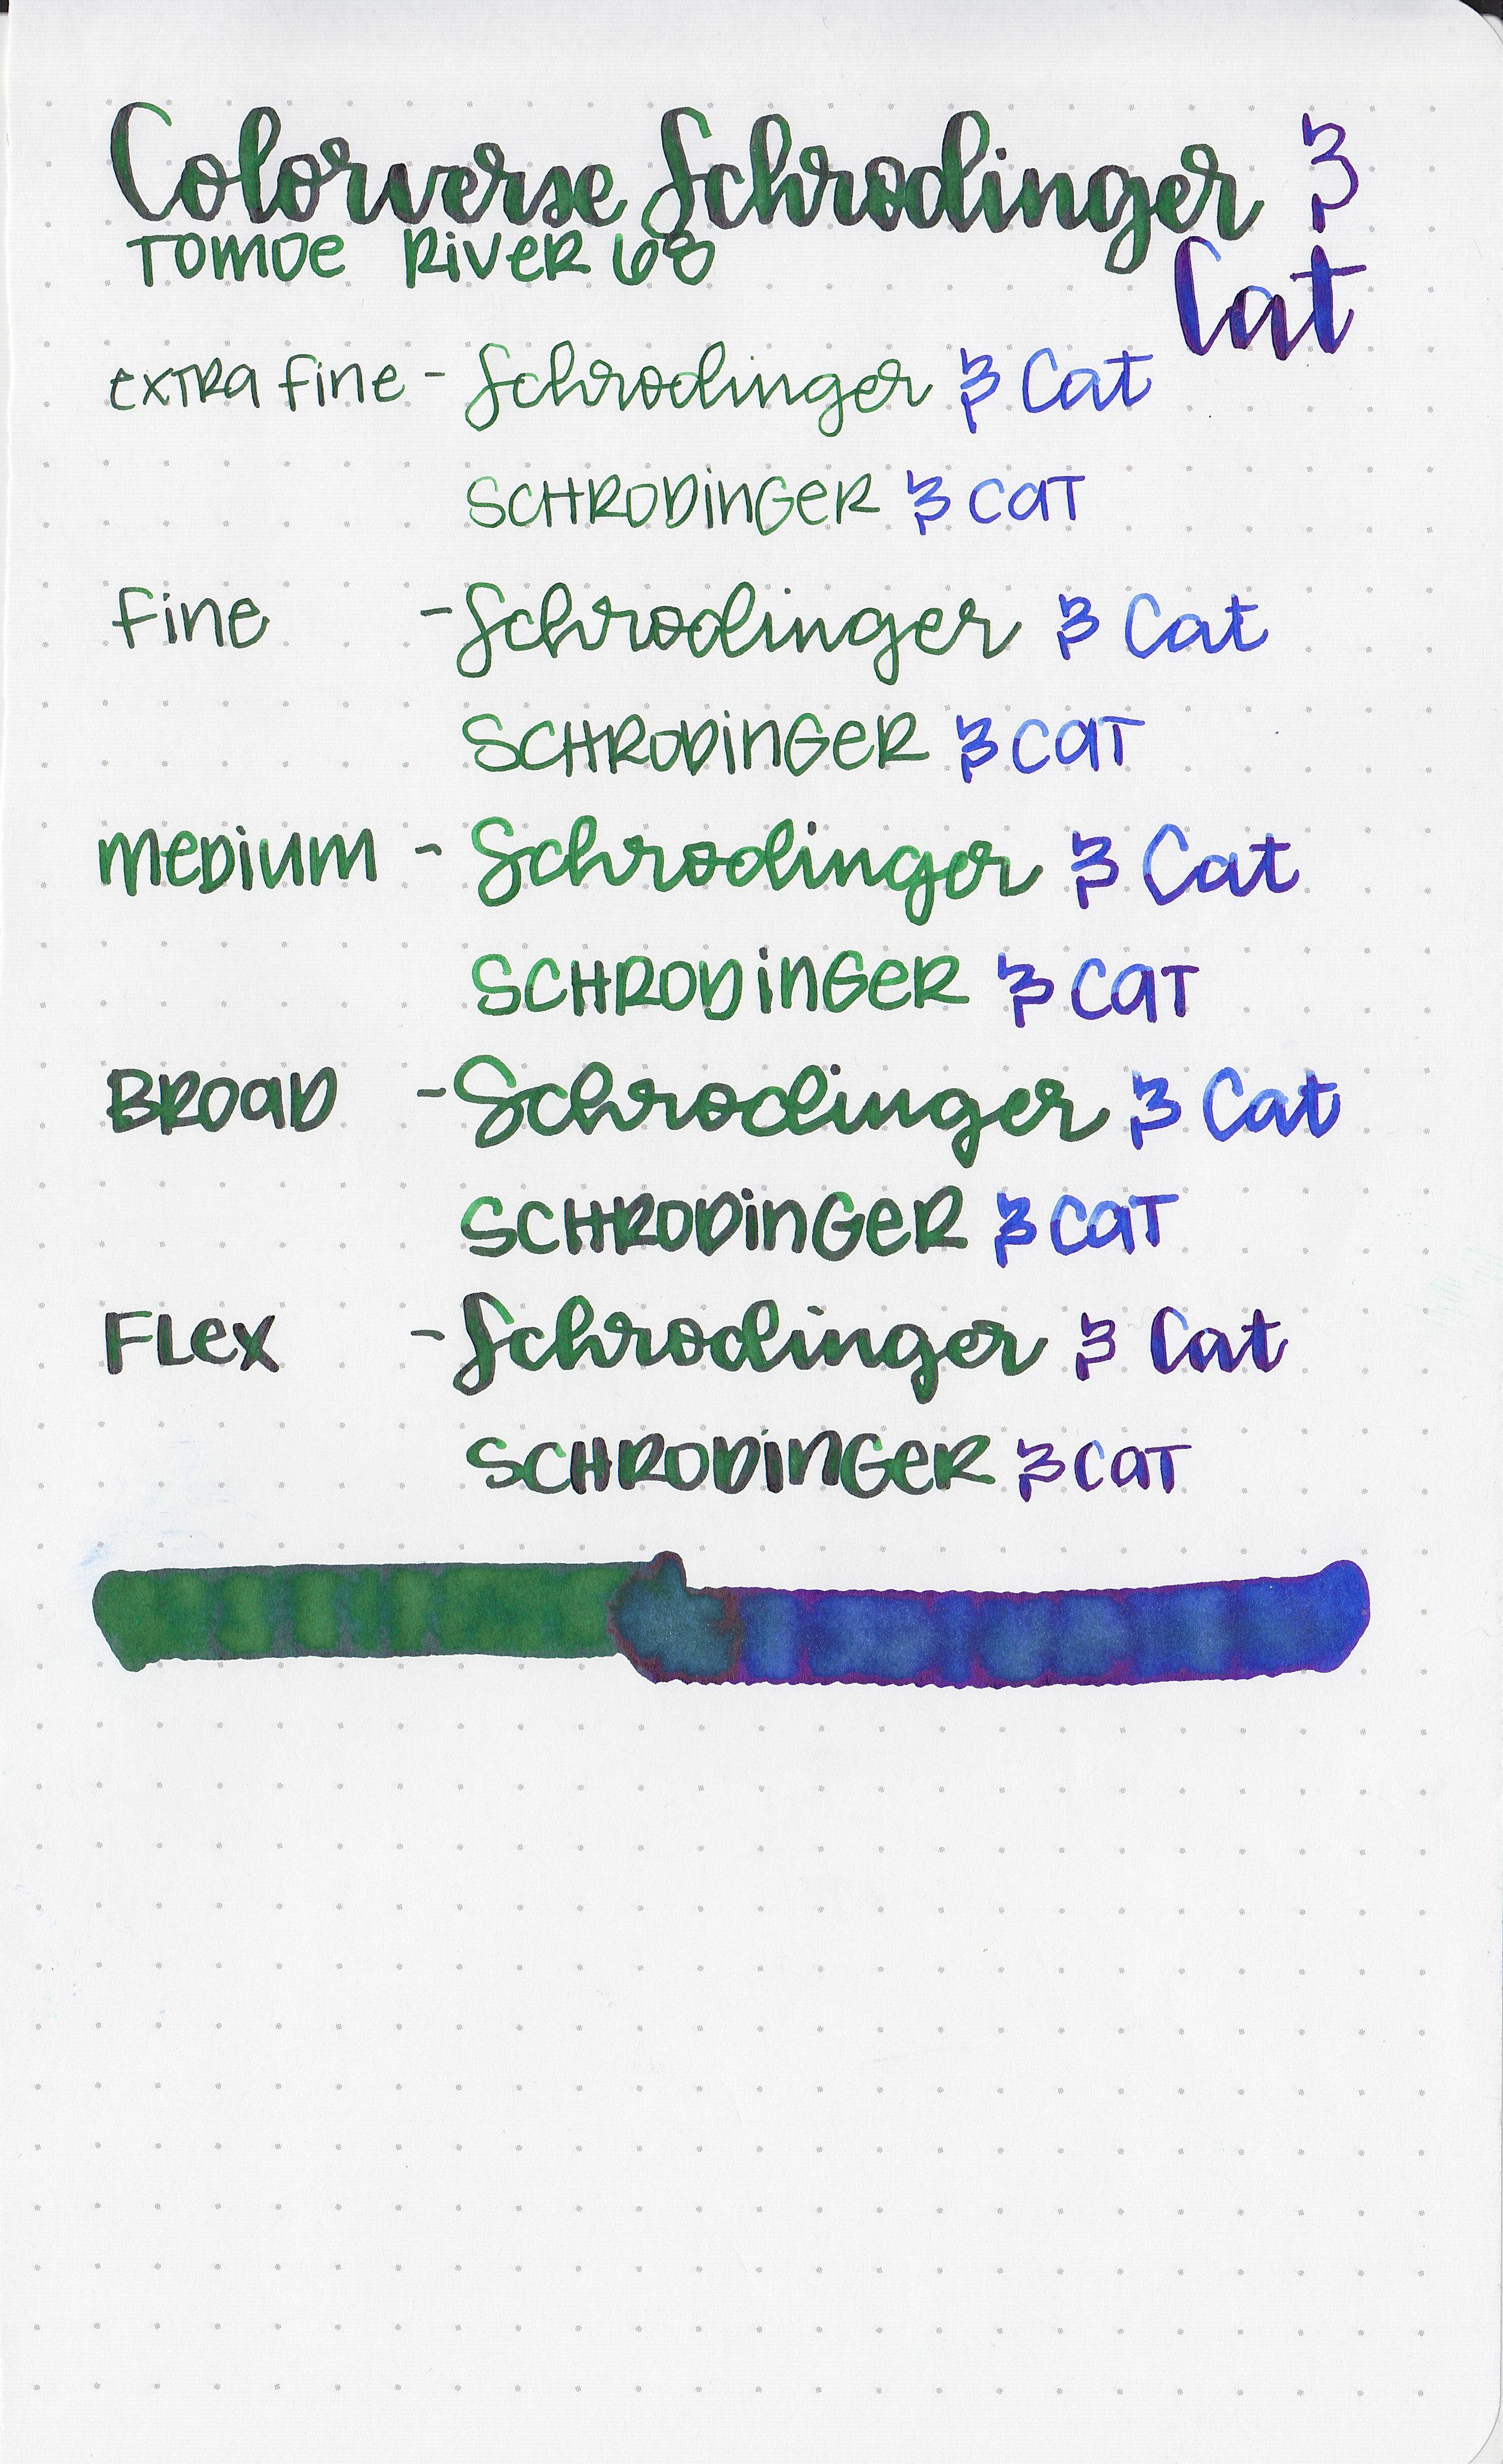 cv-schrodinger-cat-6.jpg